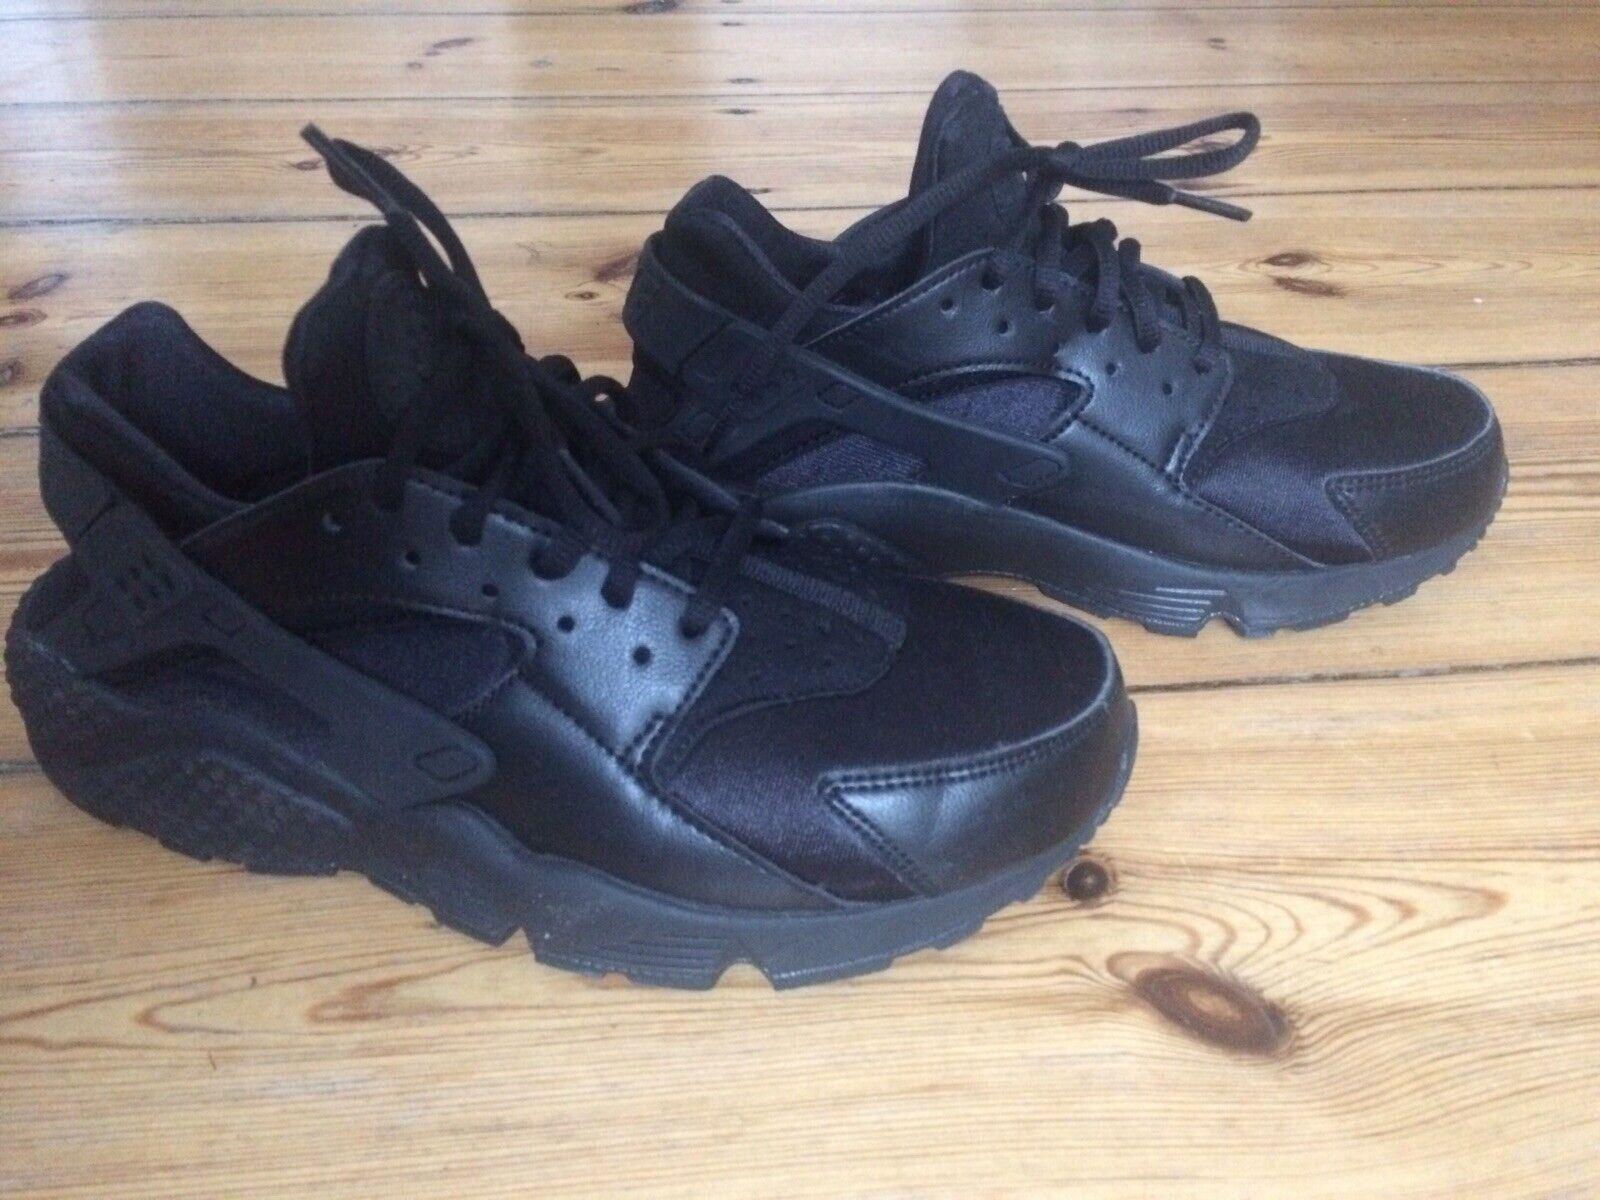 Turnschuhe Nike Huarache 39 schwarz